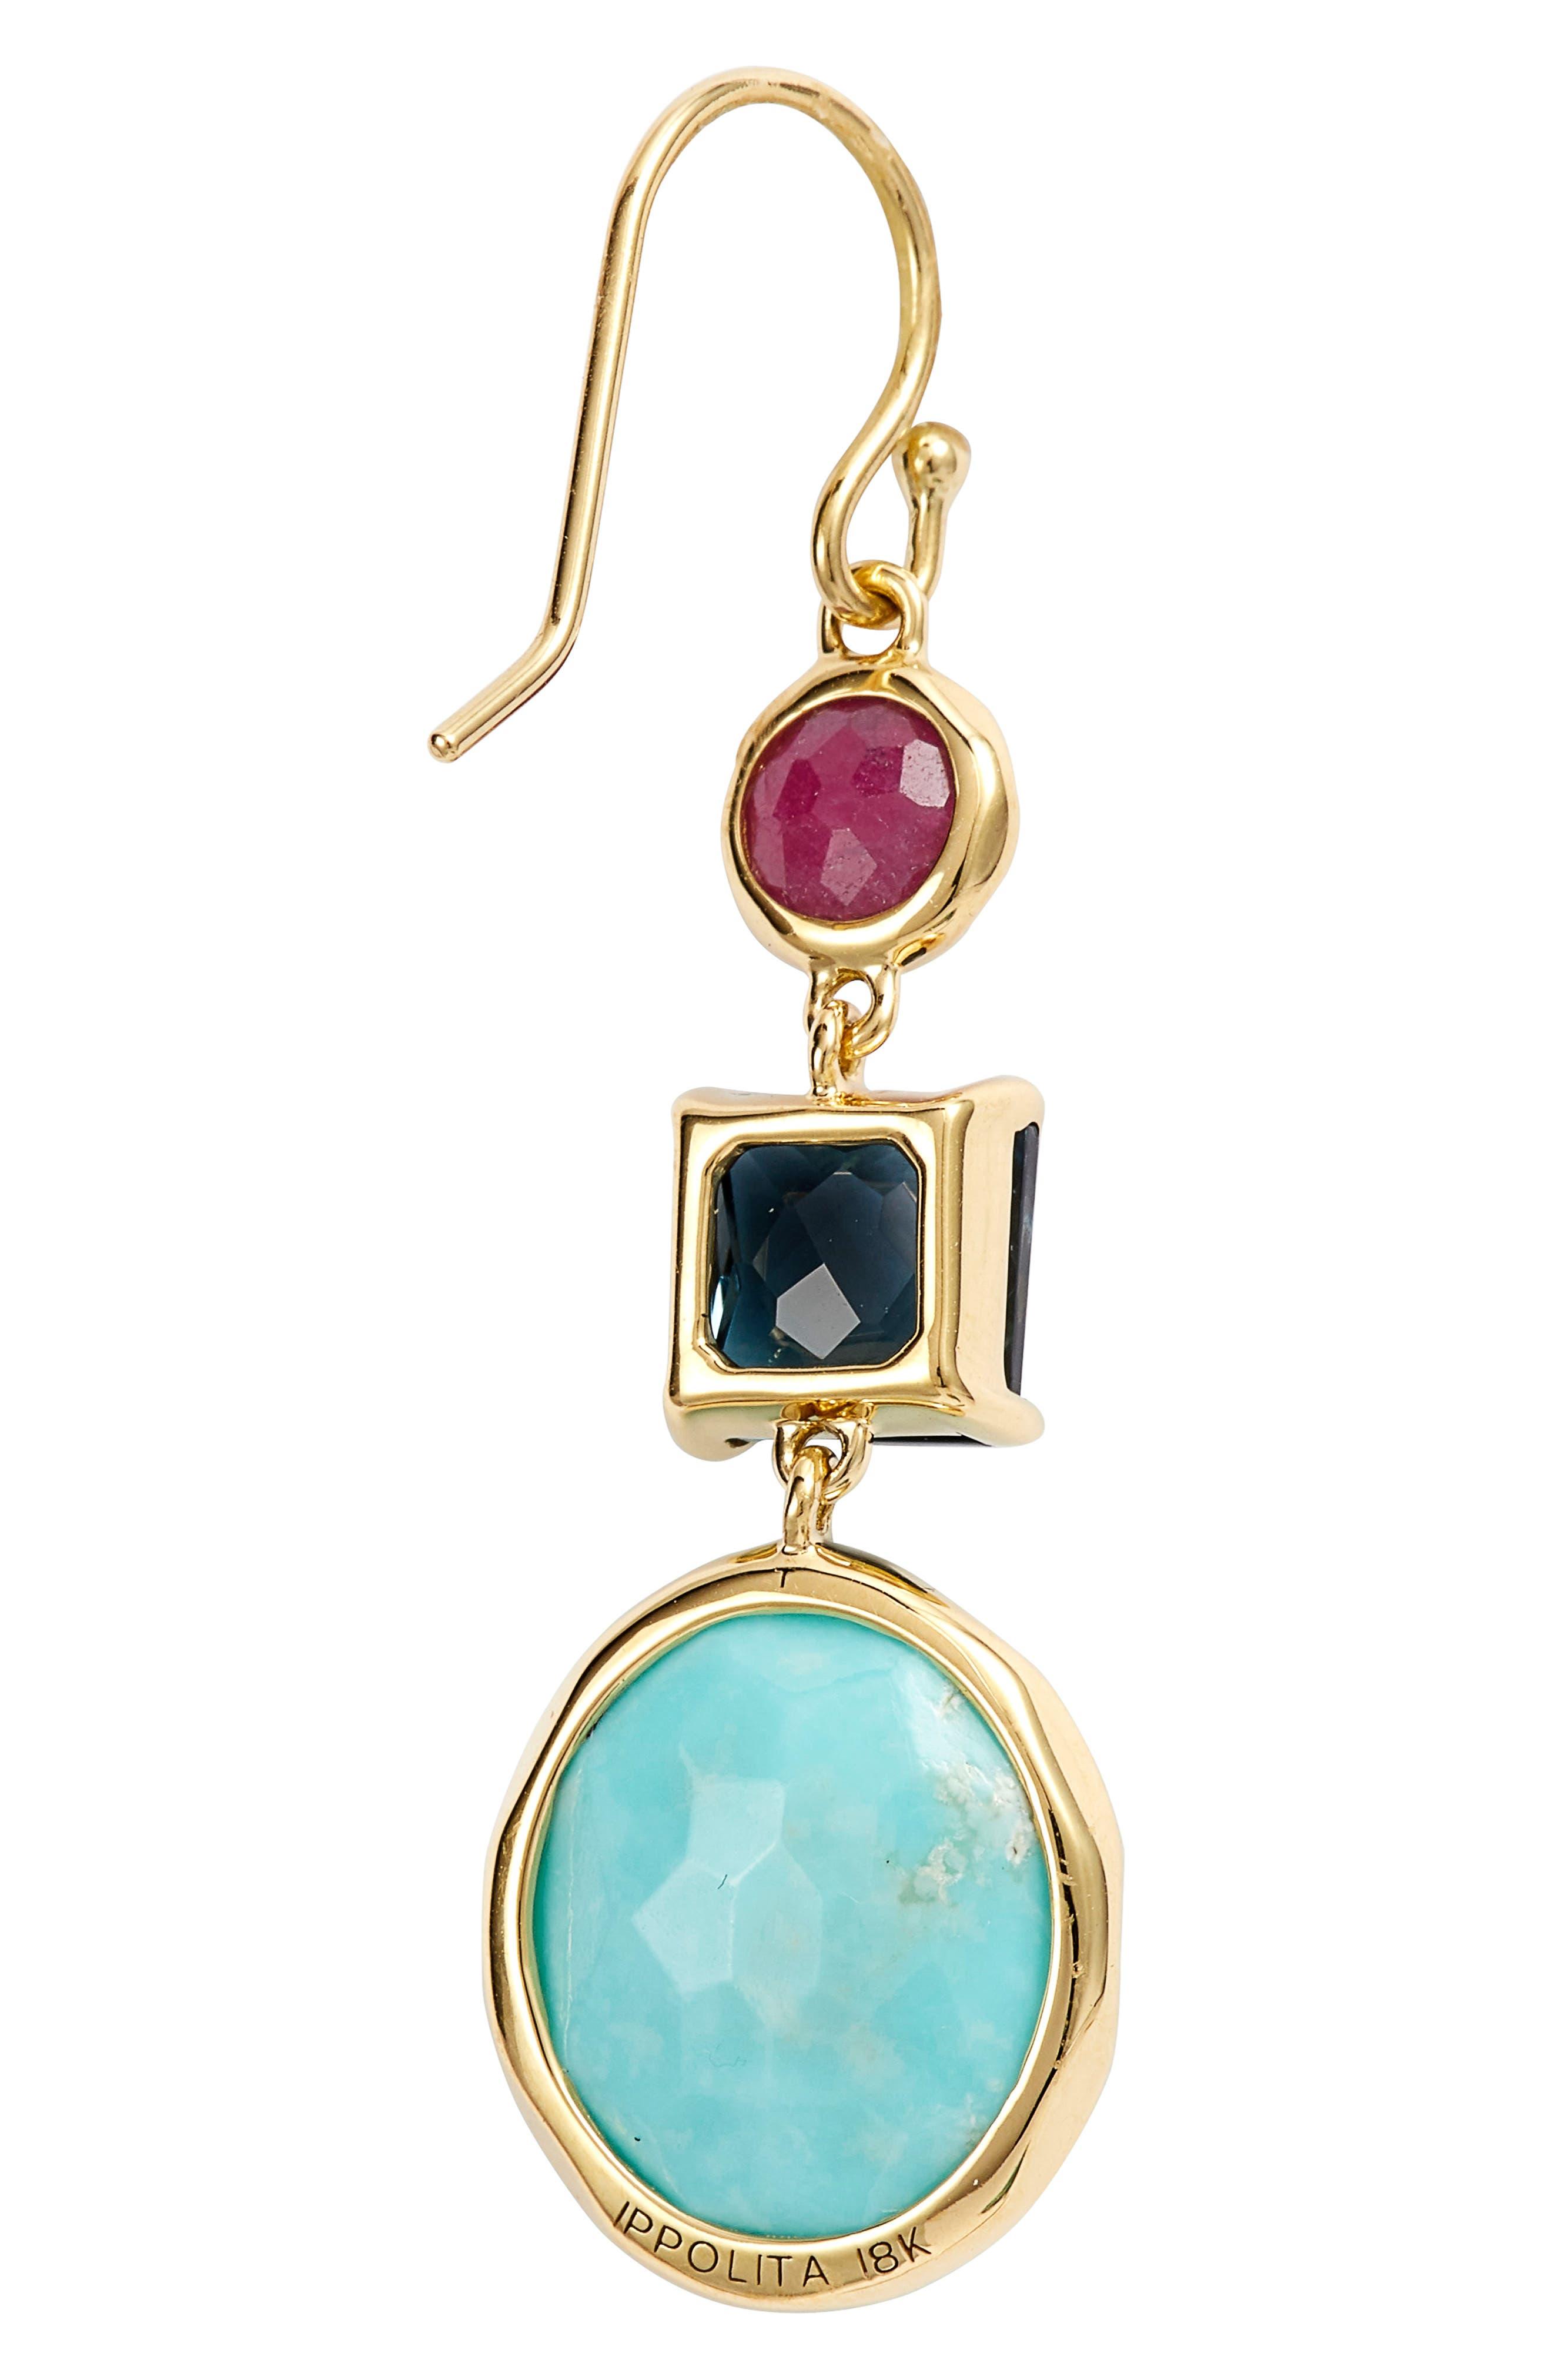 Rock Candy 18K Gold Triple Stone Earrings,                             Alternate thumbnail 3, color,                             GOLD/ SUMMER RAIN